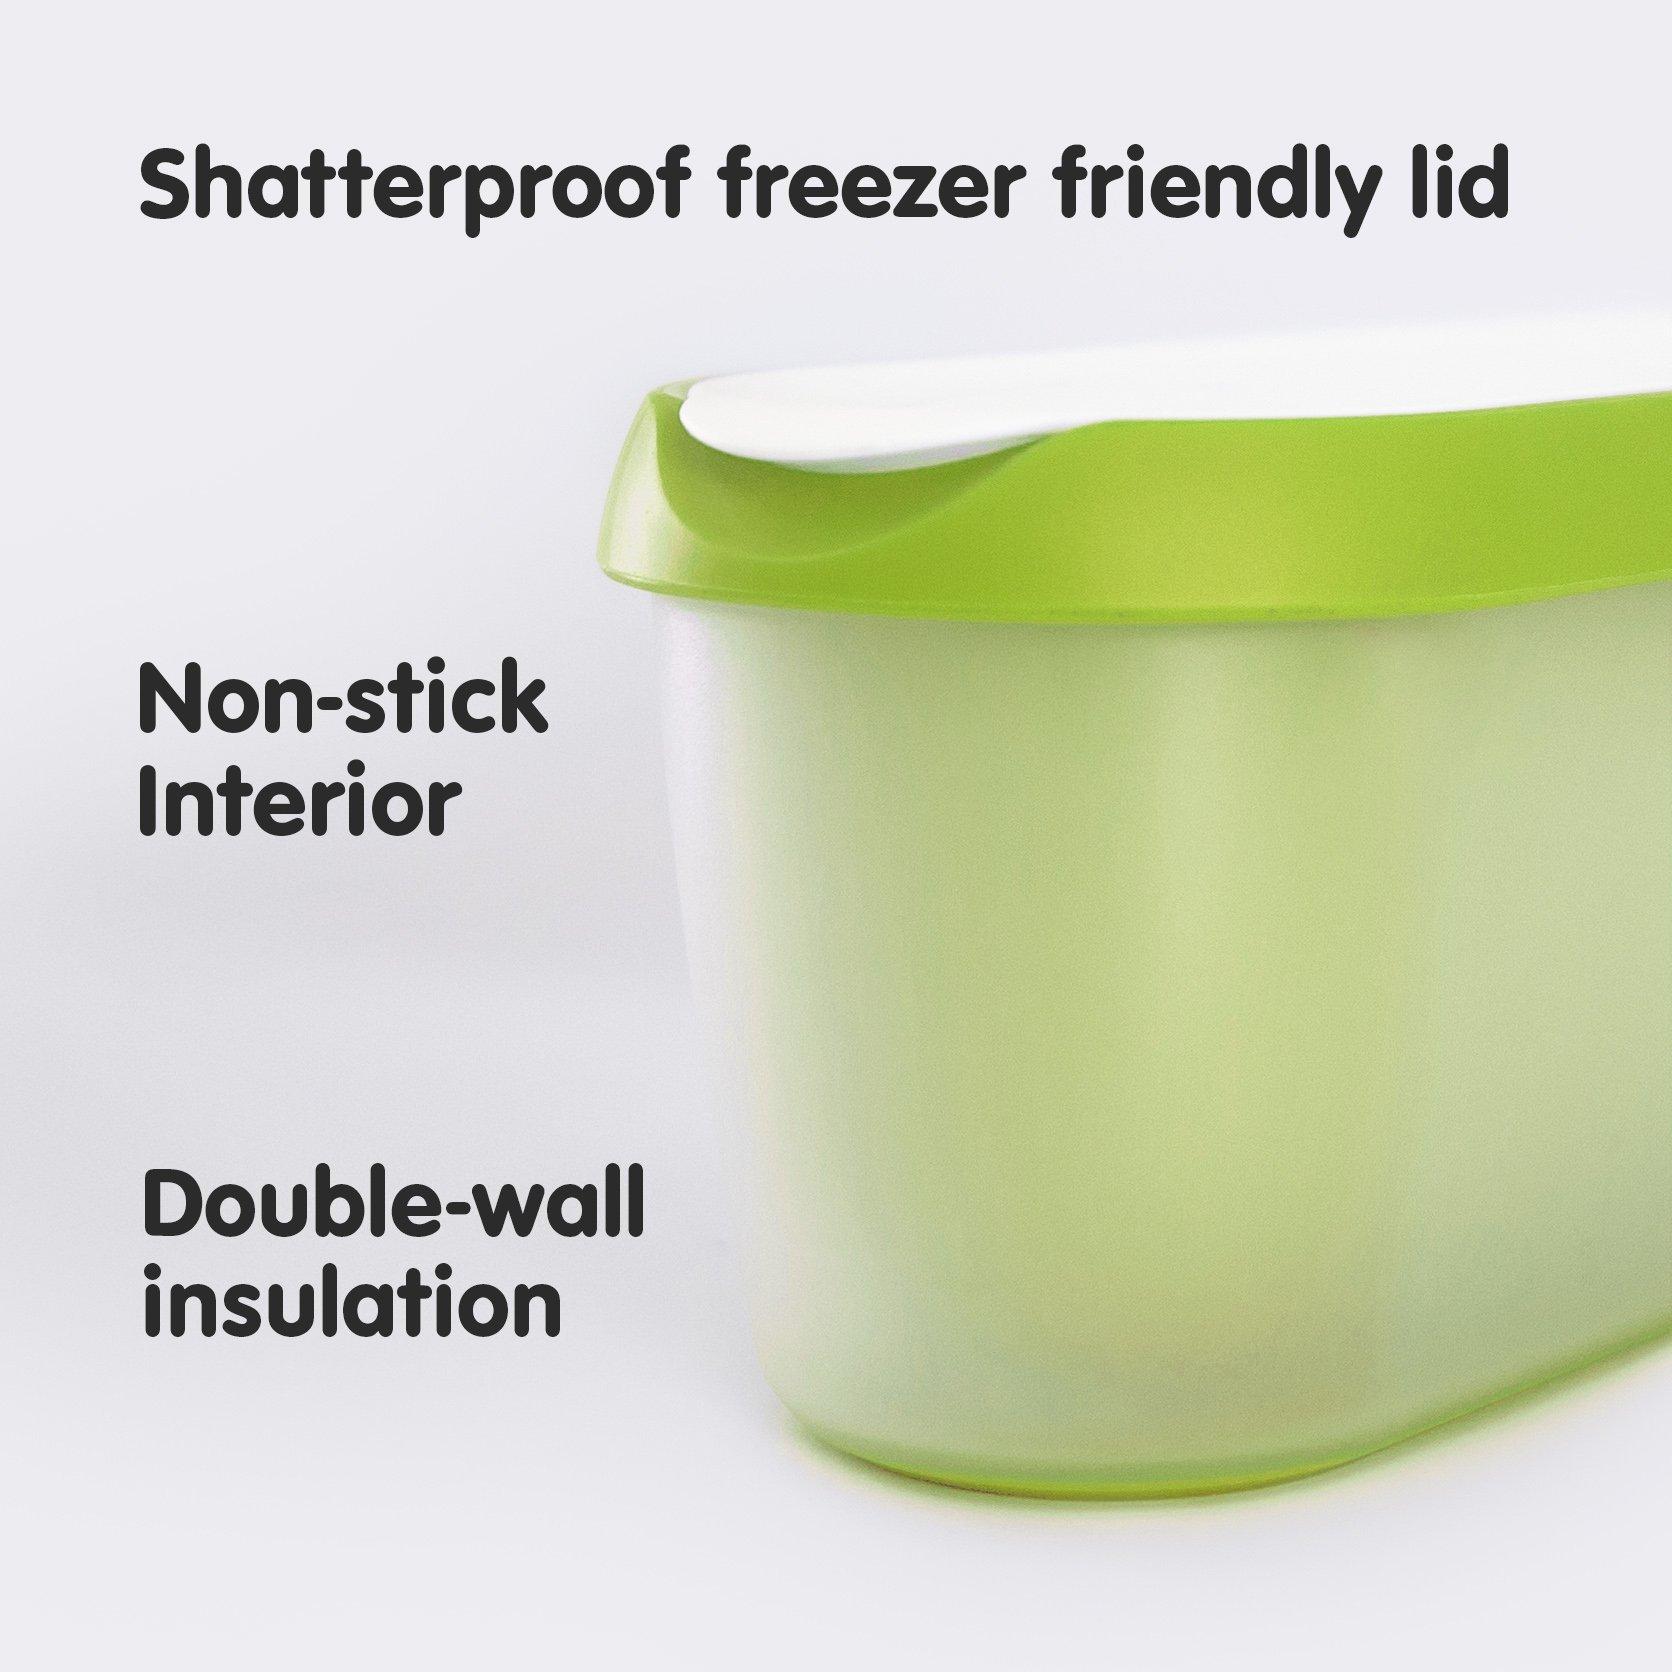 SUMO Ice Cream Containers Insulated Ice Cream Tub for Homemade Ice